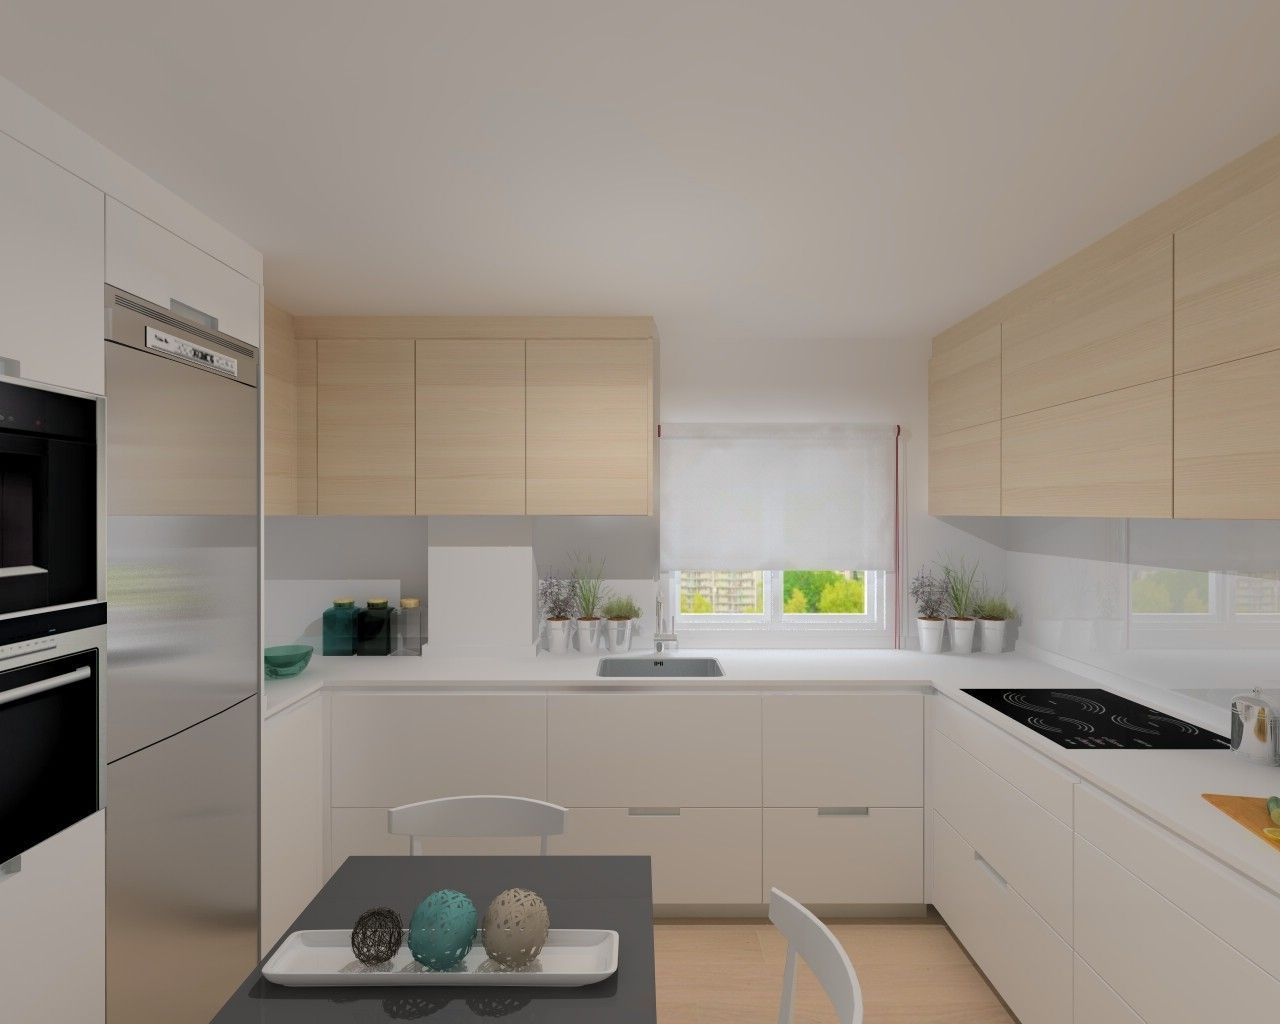 30 Casas Modernas Con Disenos De Vanguardia Con Imagenes